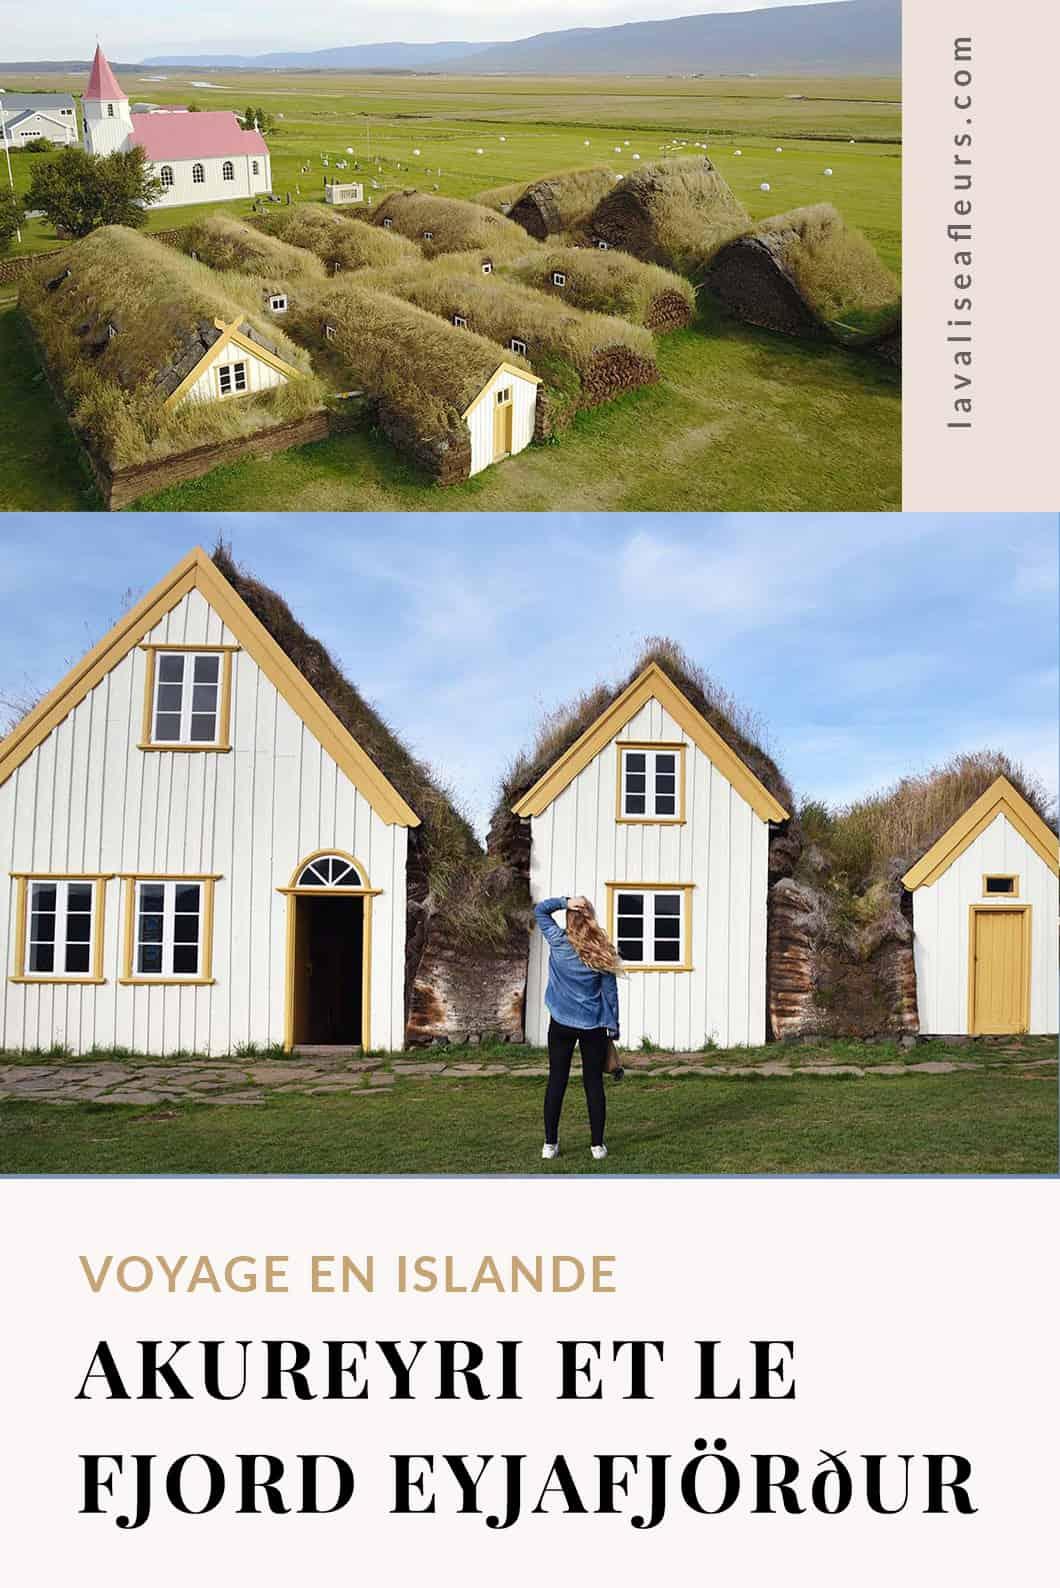 Visiter Akureyri et le Fjord Eyjafjörður en Islande